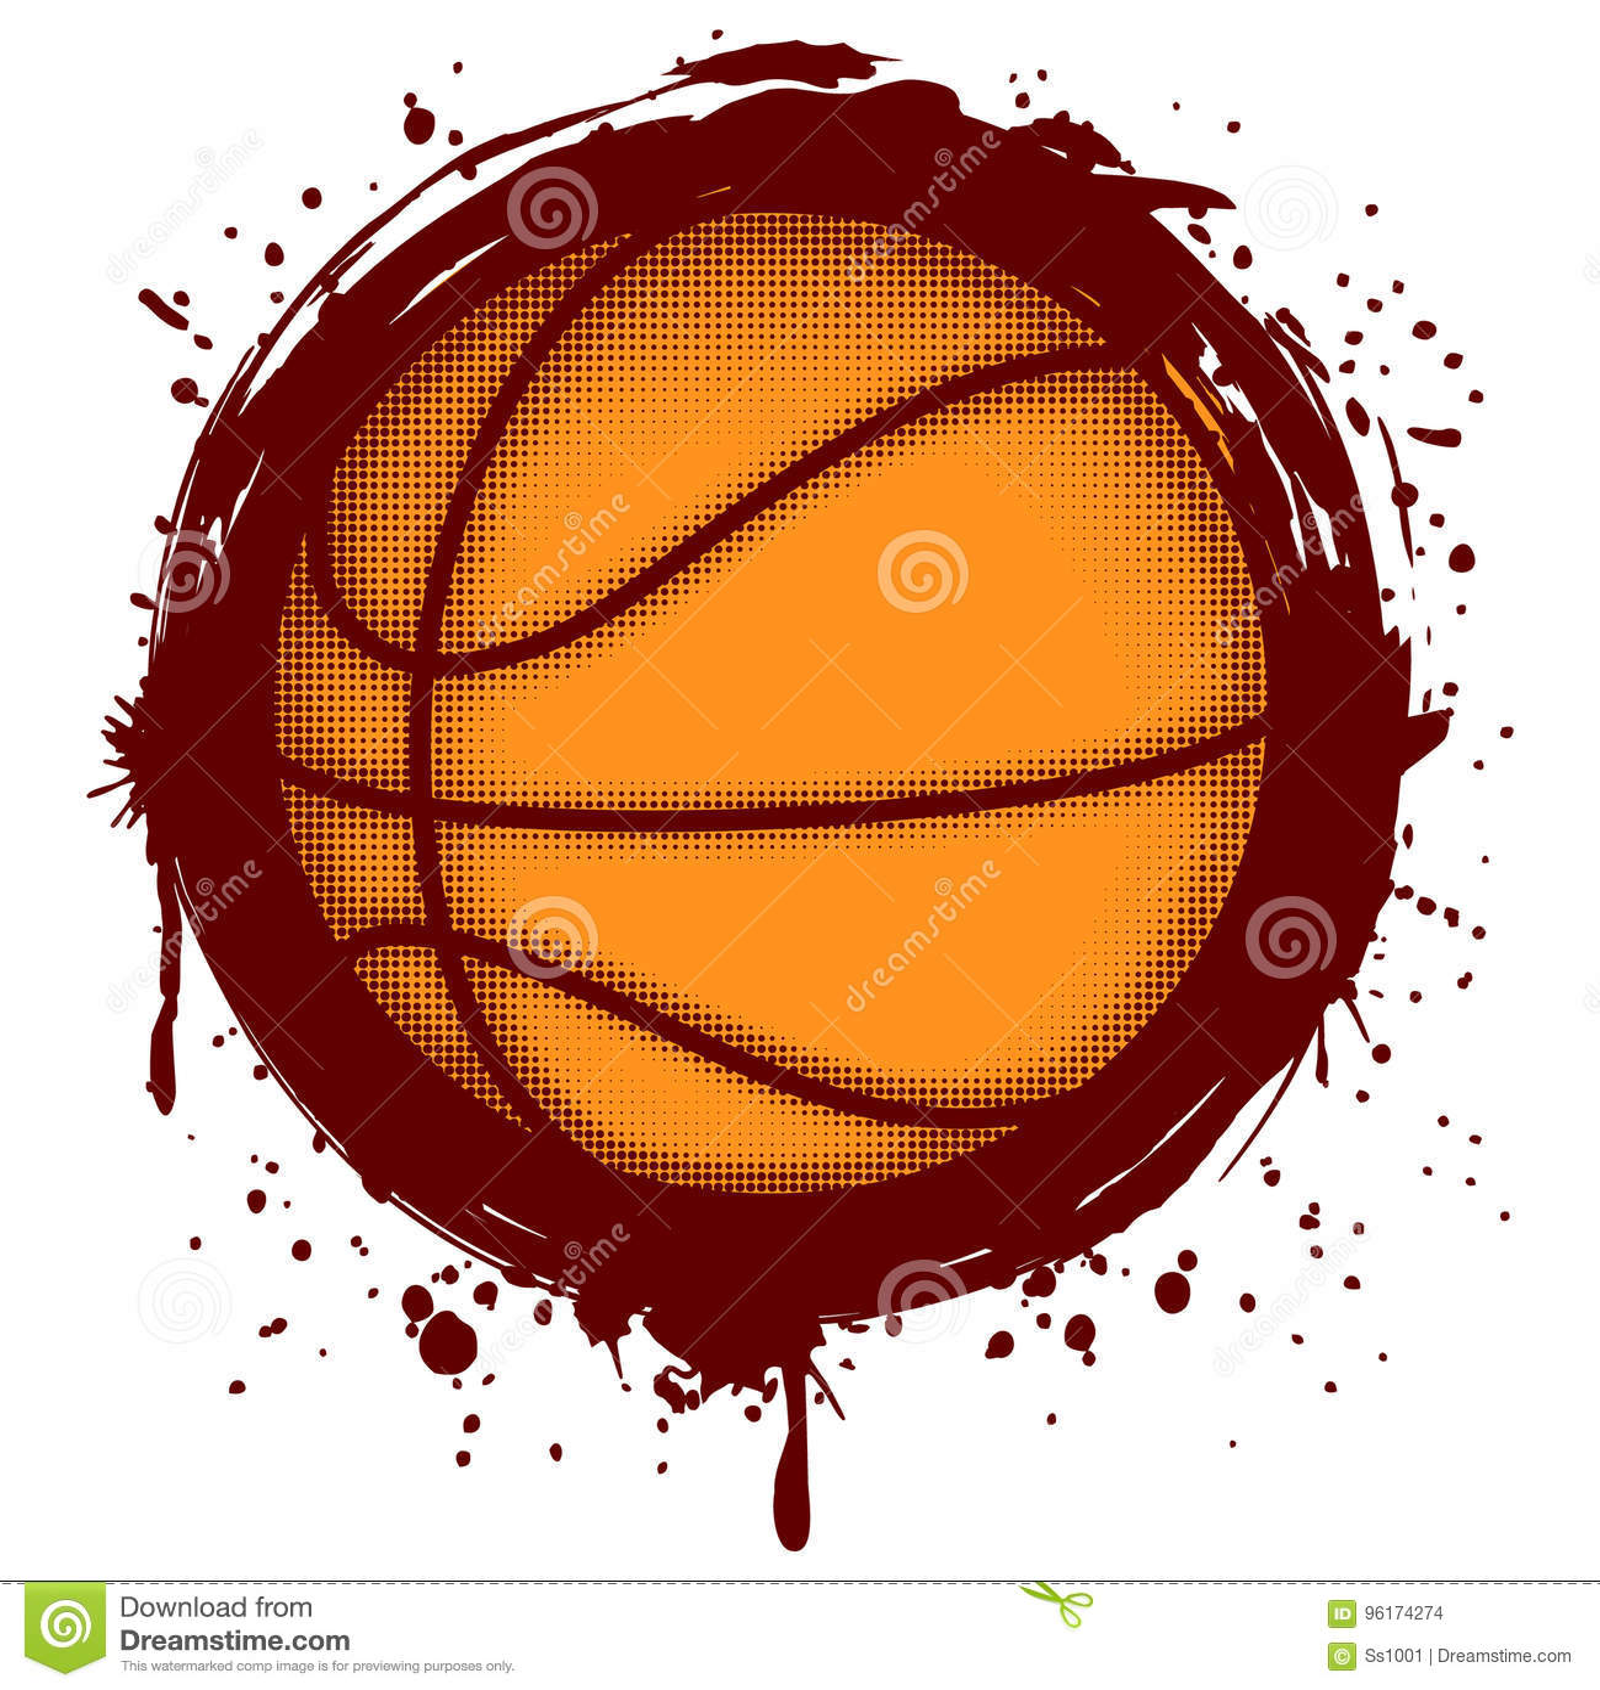 Basketball Stock Vector Illustration Of Basketball Jump 96174274,Lehenga Blouse Designs 2020 Front